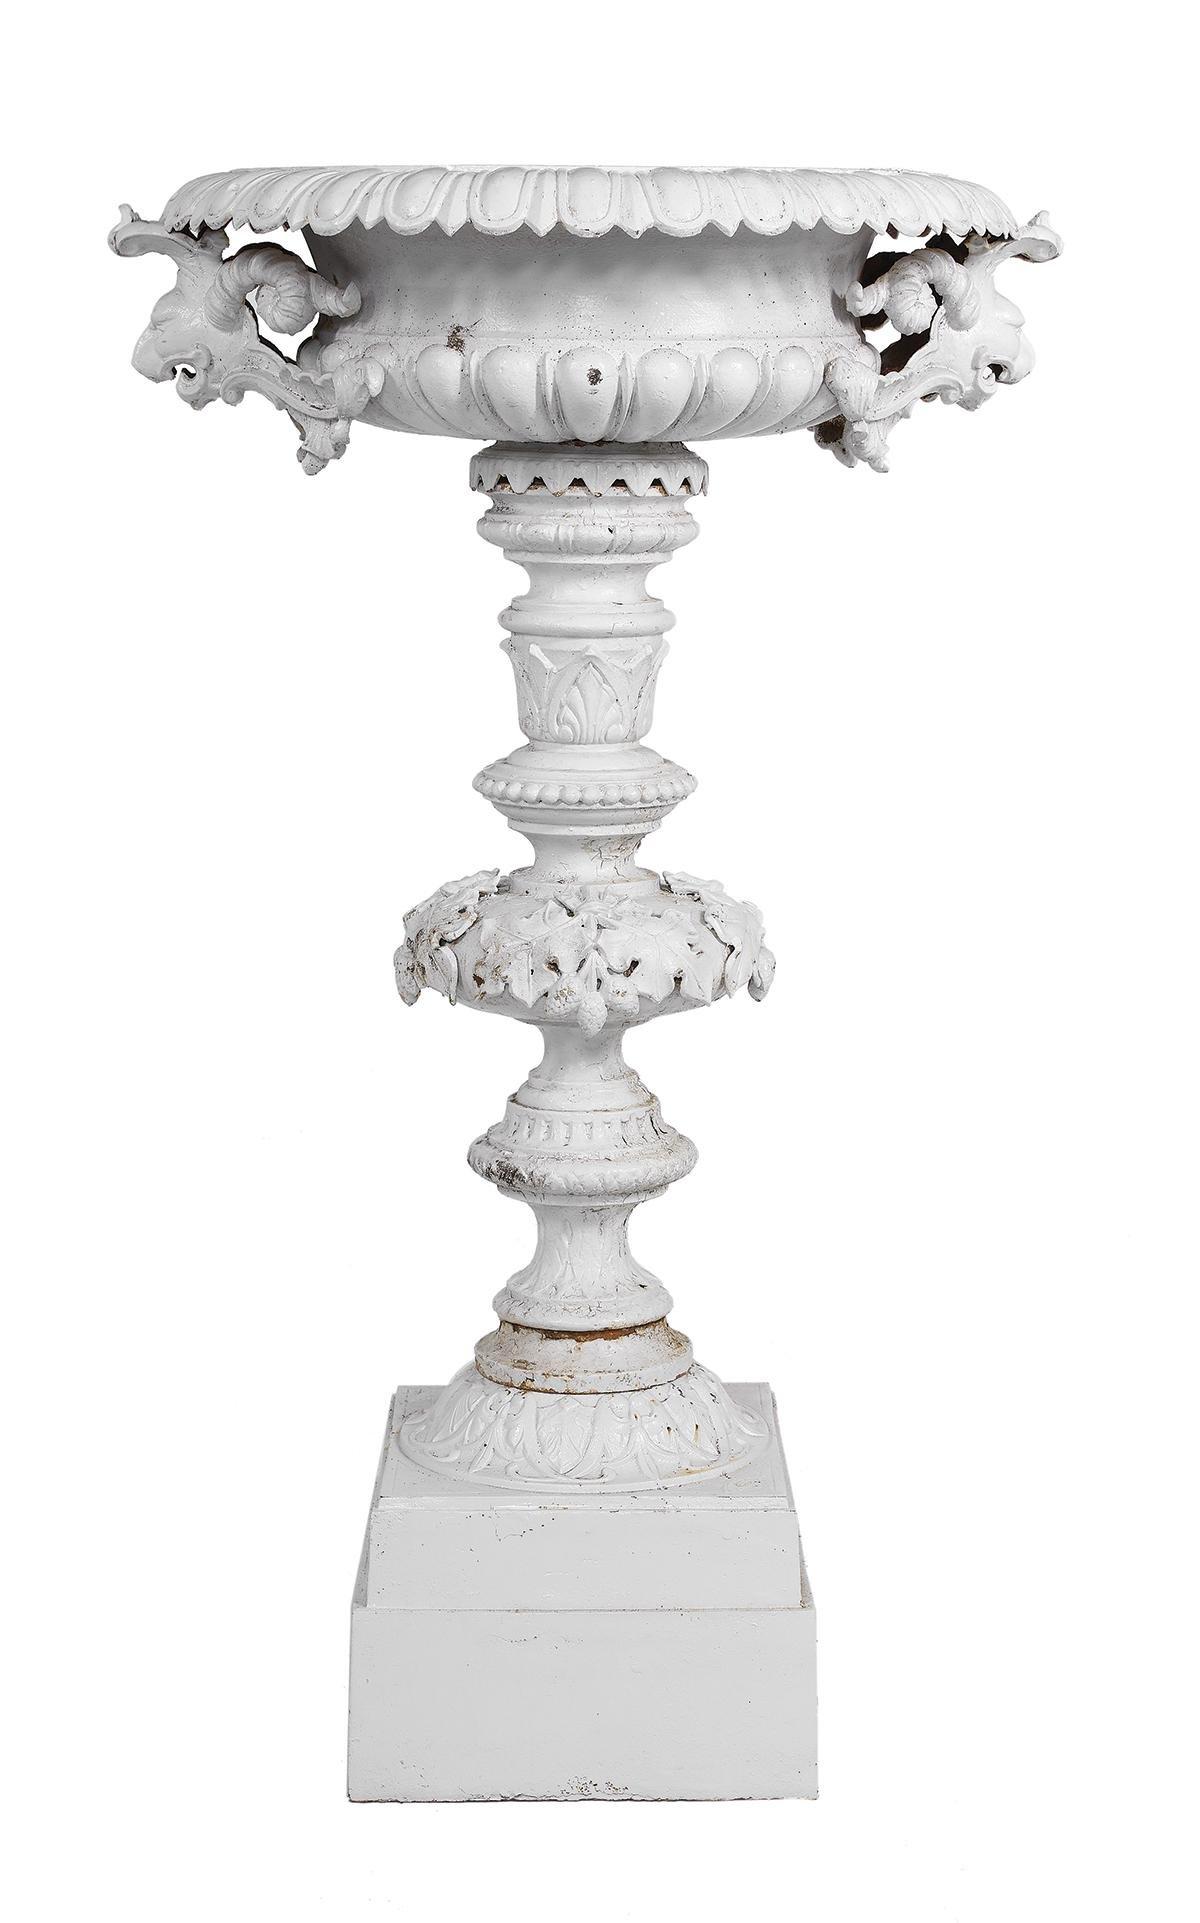 Monumental Labeled Fiske Cast Iron Garden Urn